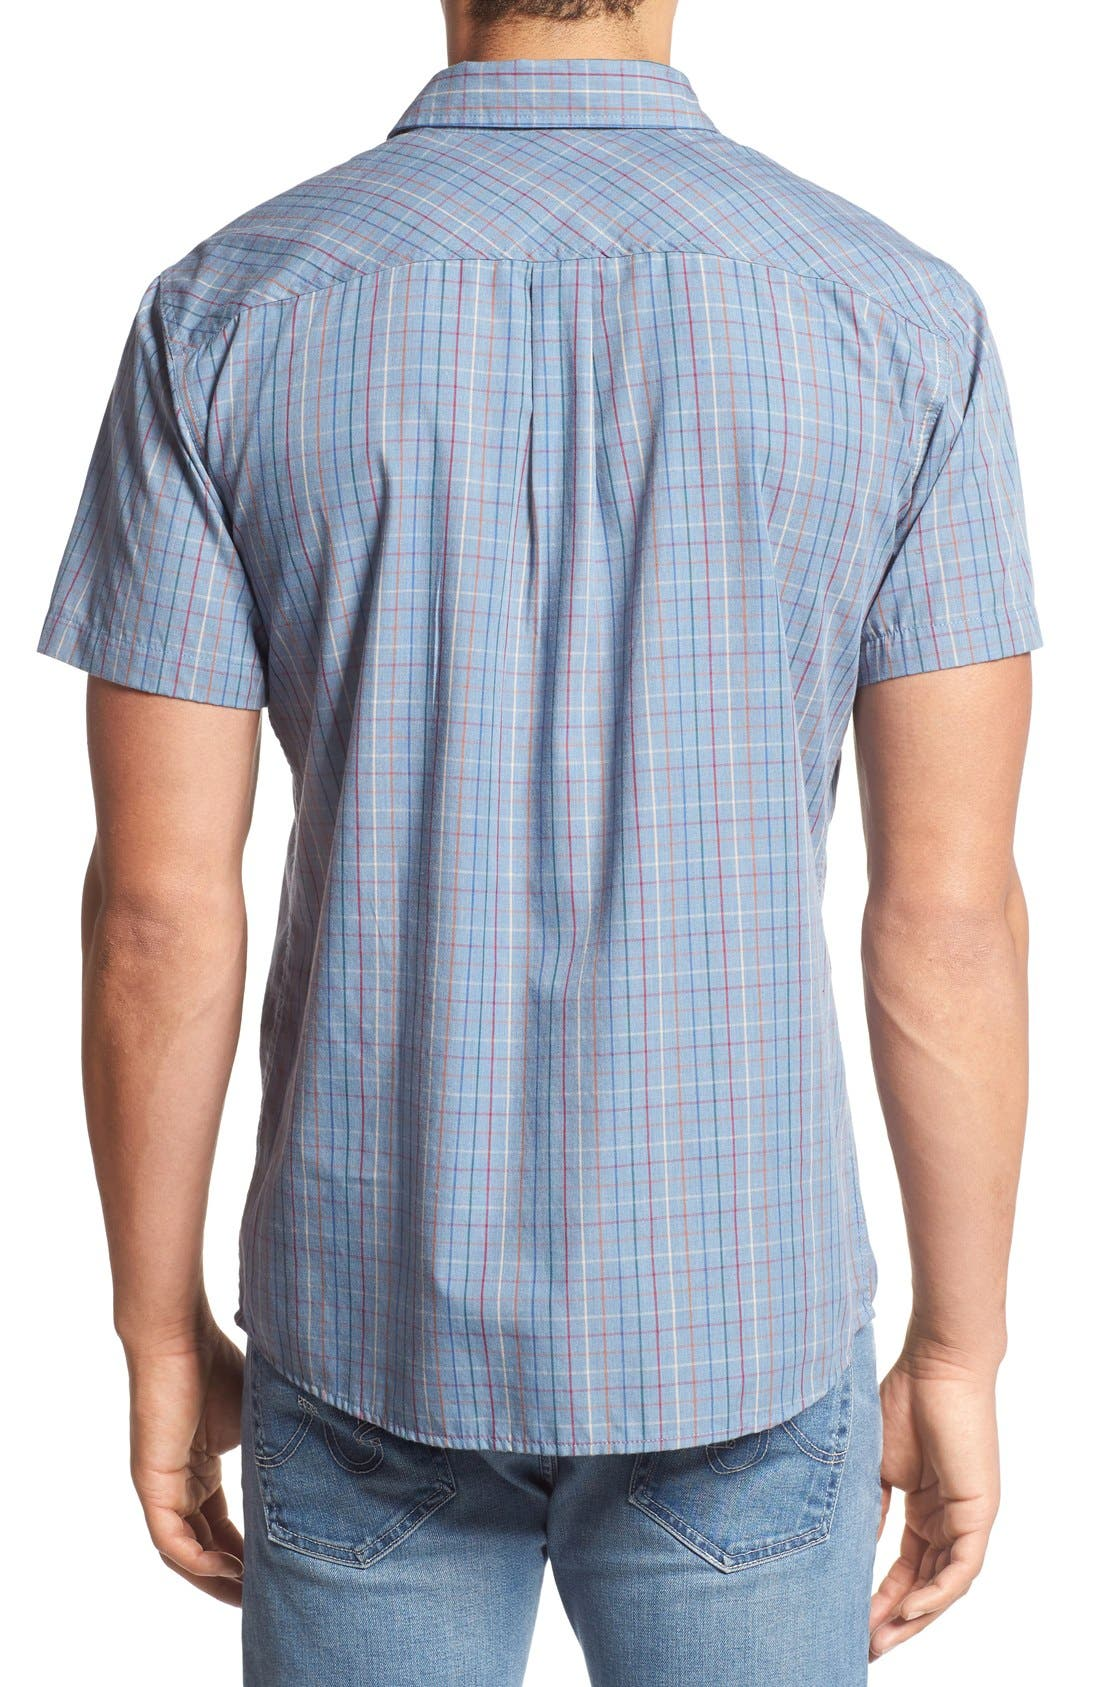 'Memphis' Trim Fit Plaid Short Sleeve Woven Shirt,                             Alternate thumbnail 2, color,                             Washed Blue